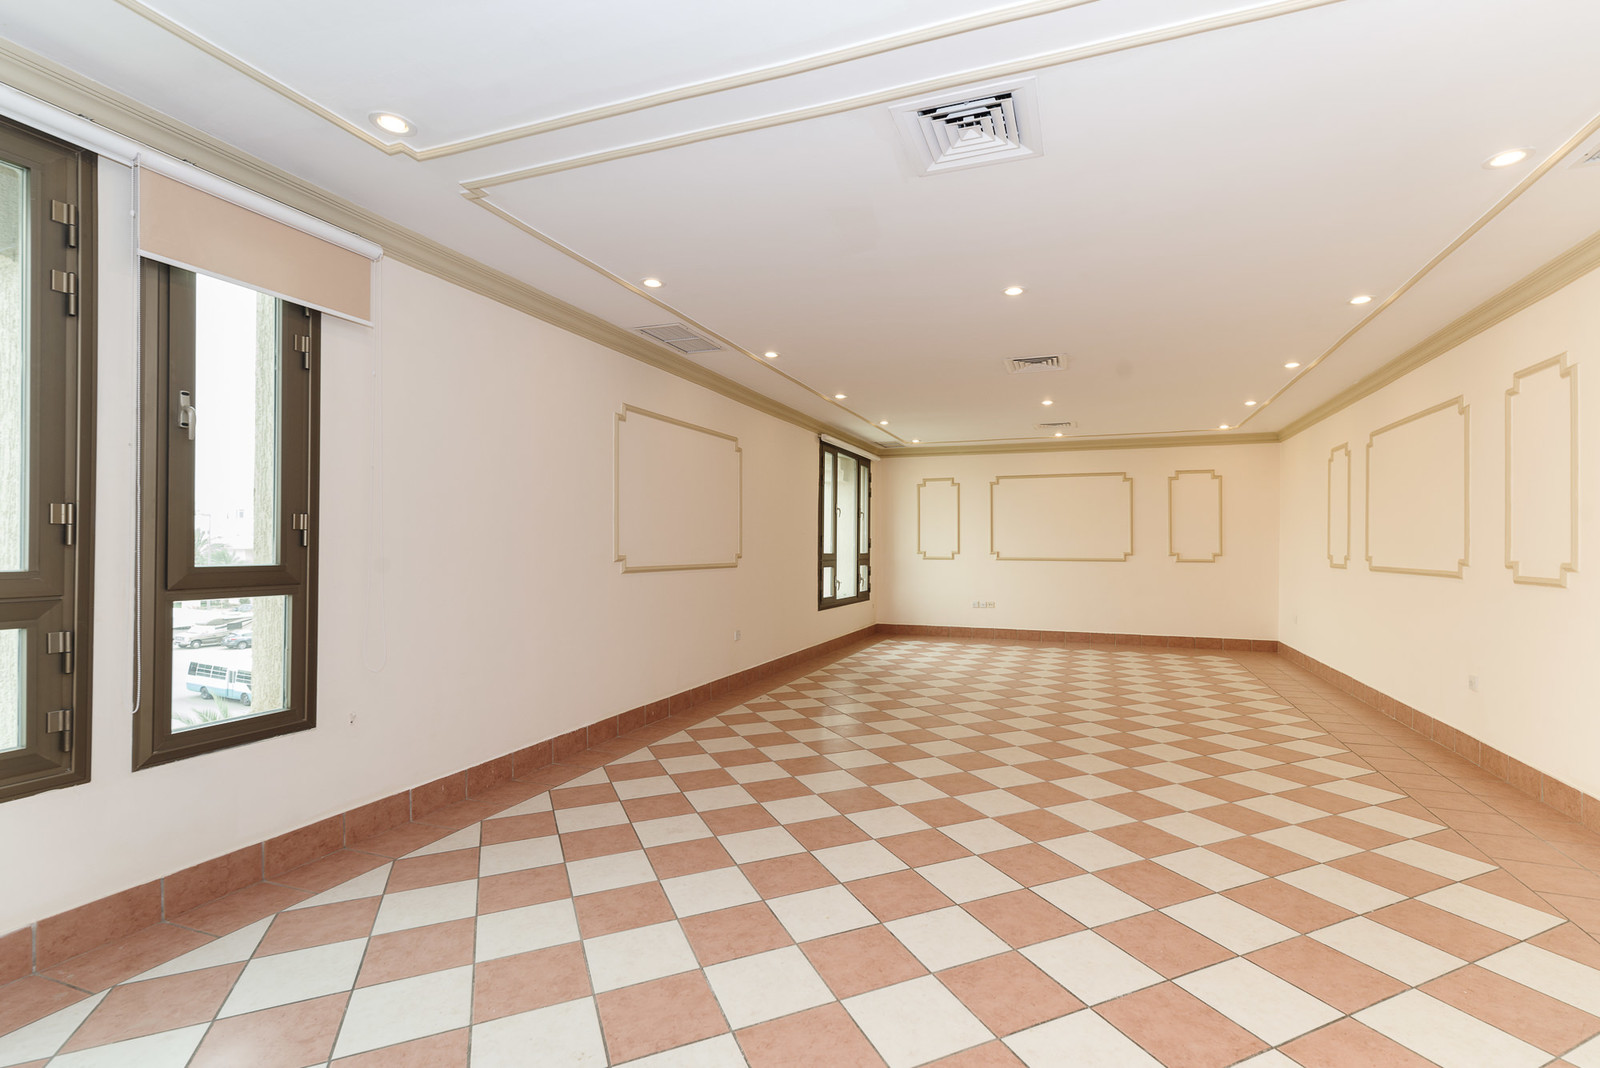 Surra – unfurnished, large, three bedroom apartment